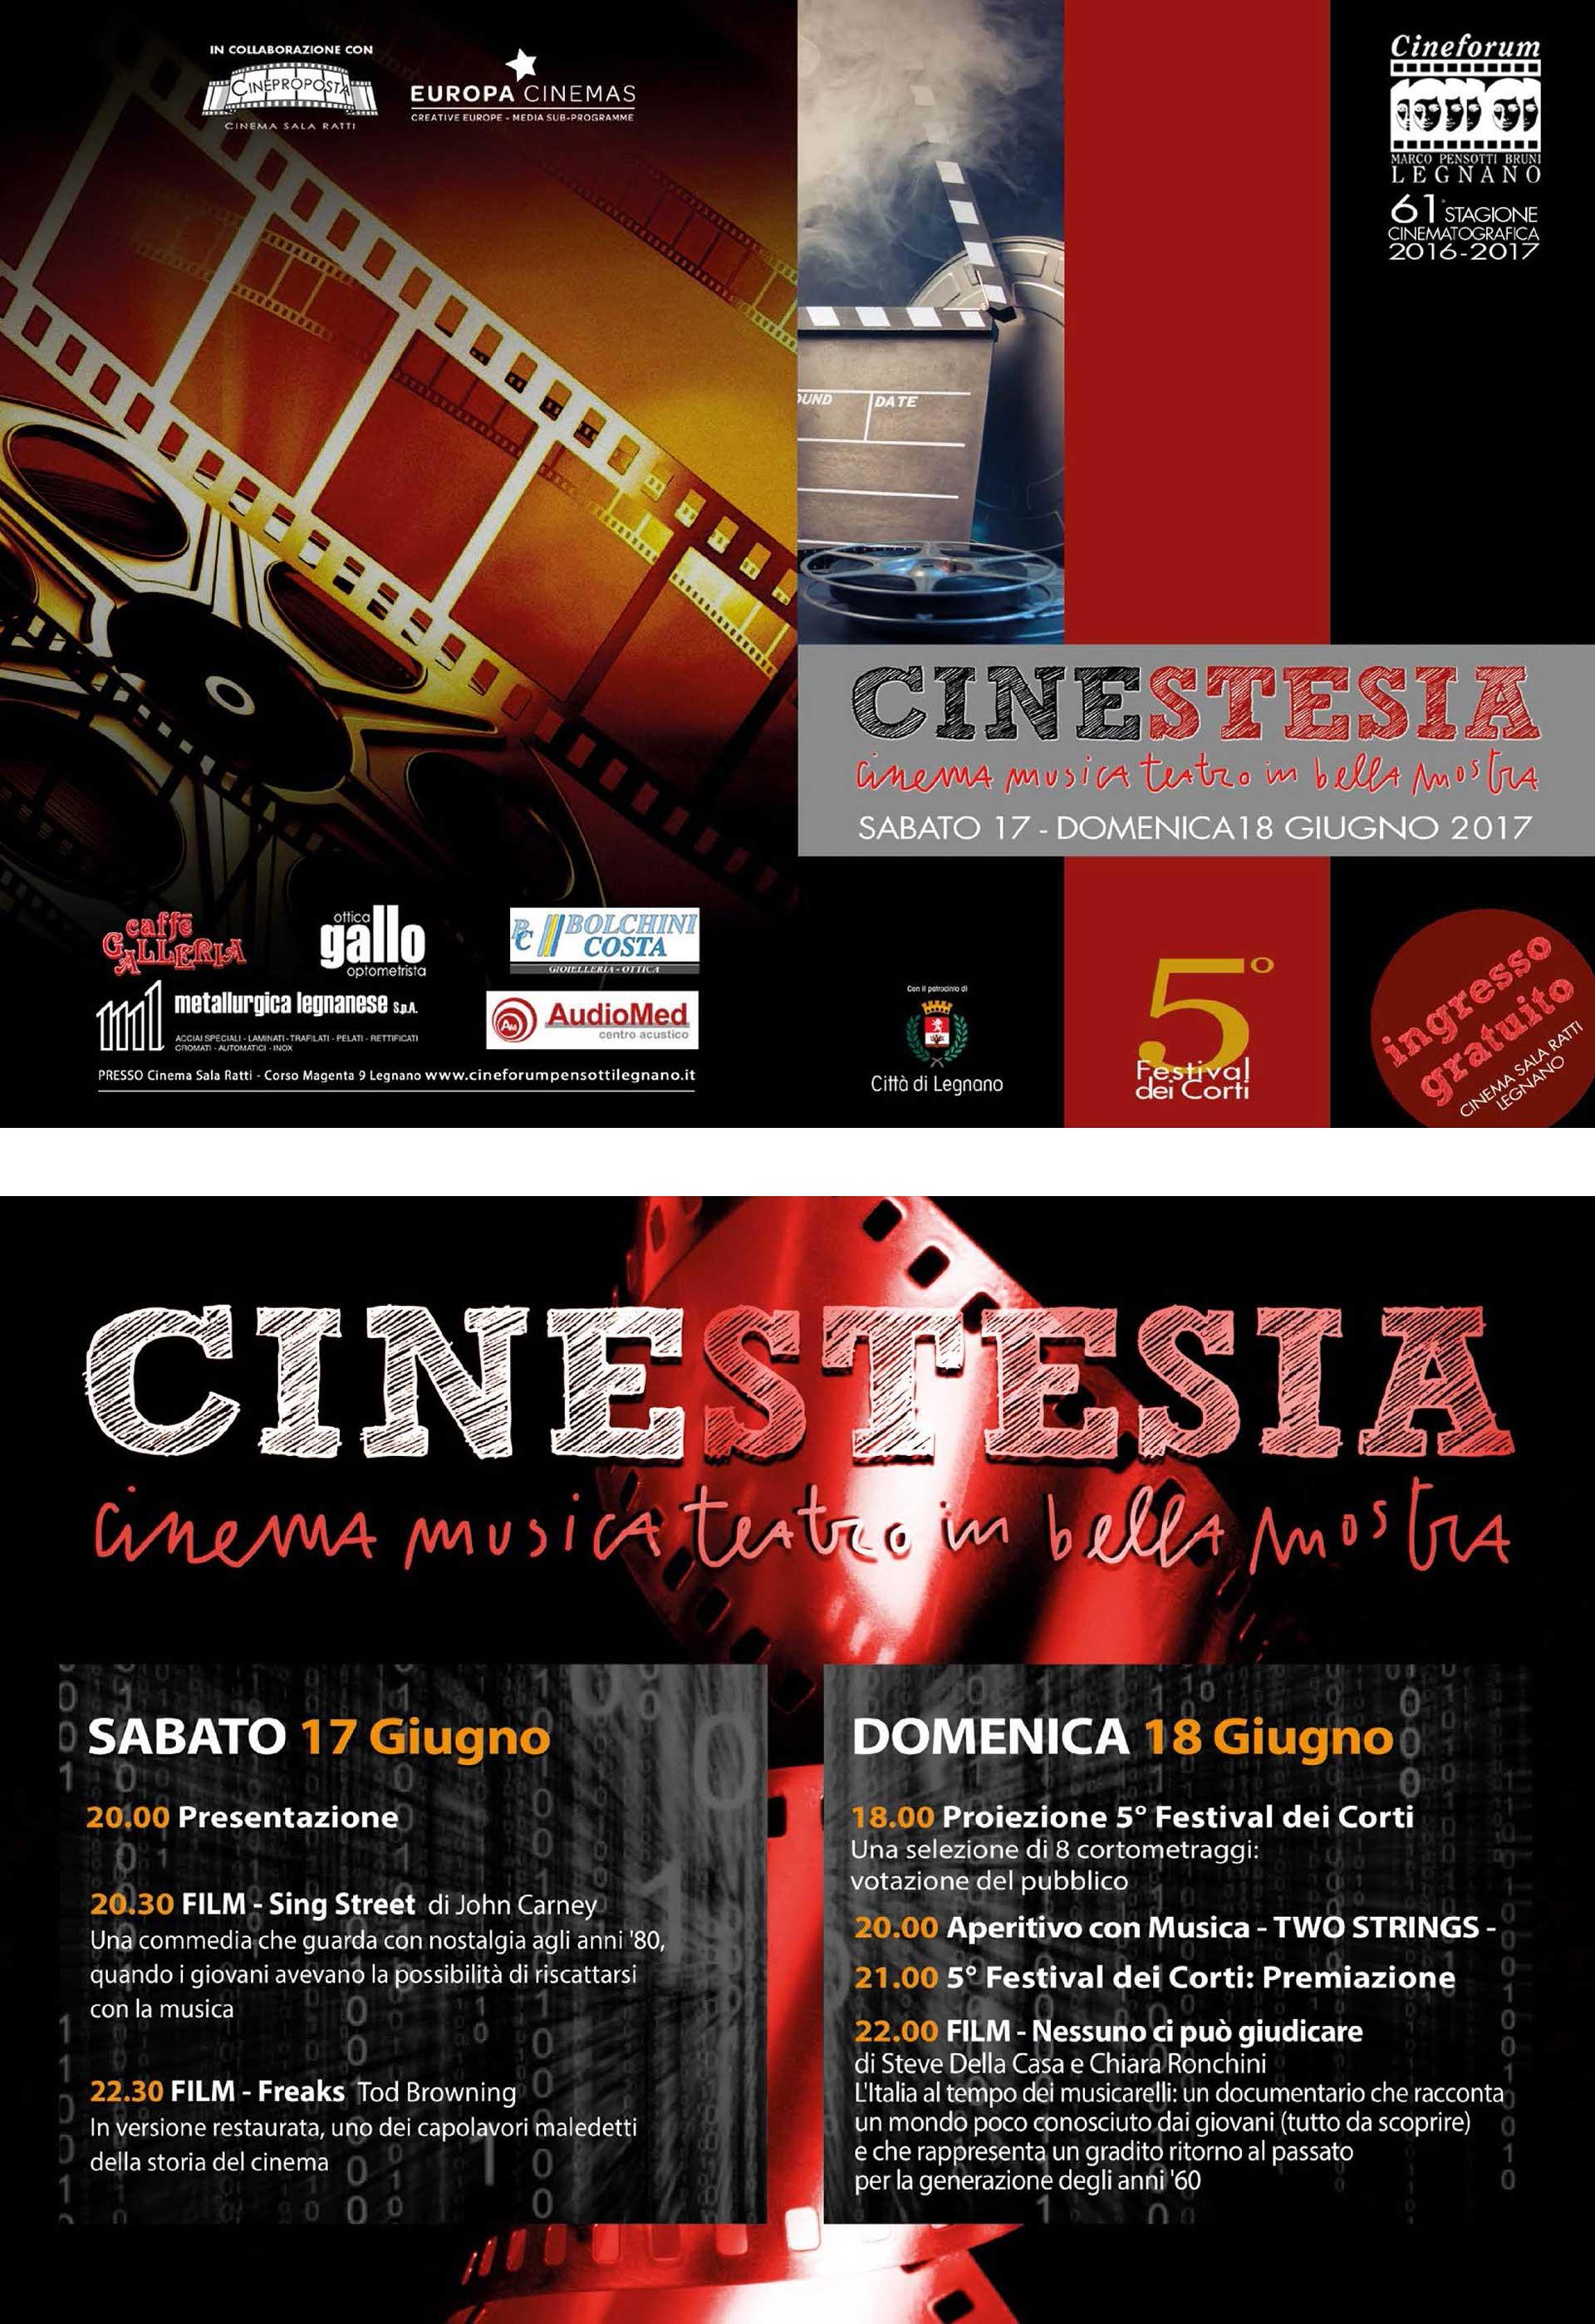 Cinestesia2017_Volantino_A4_F_R_bassa_Pagina_1-2